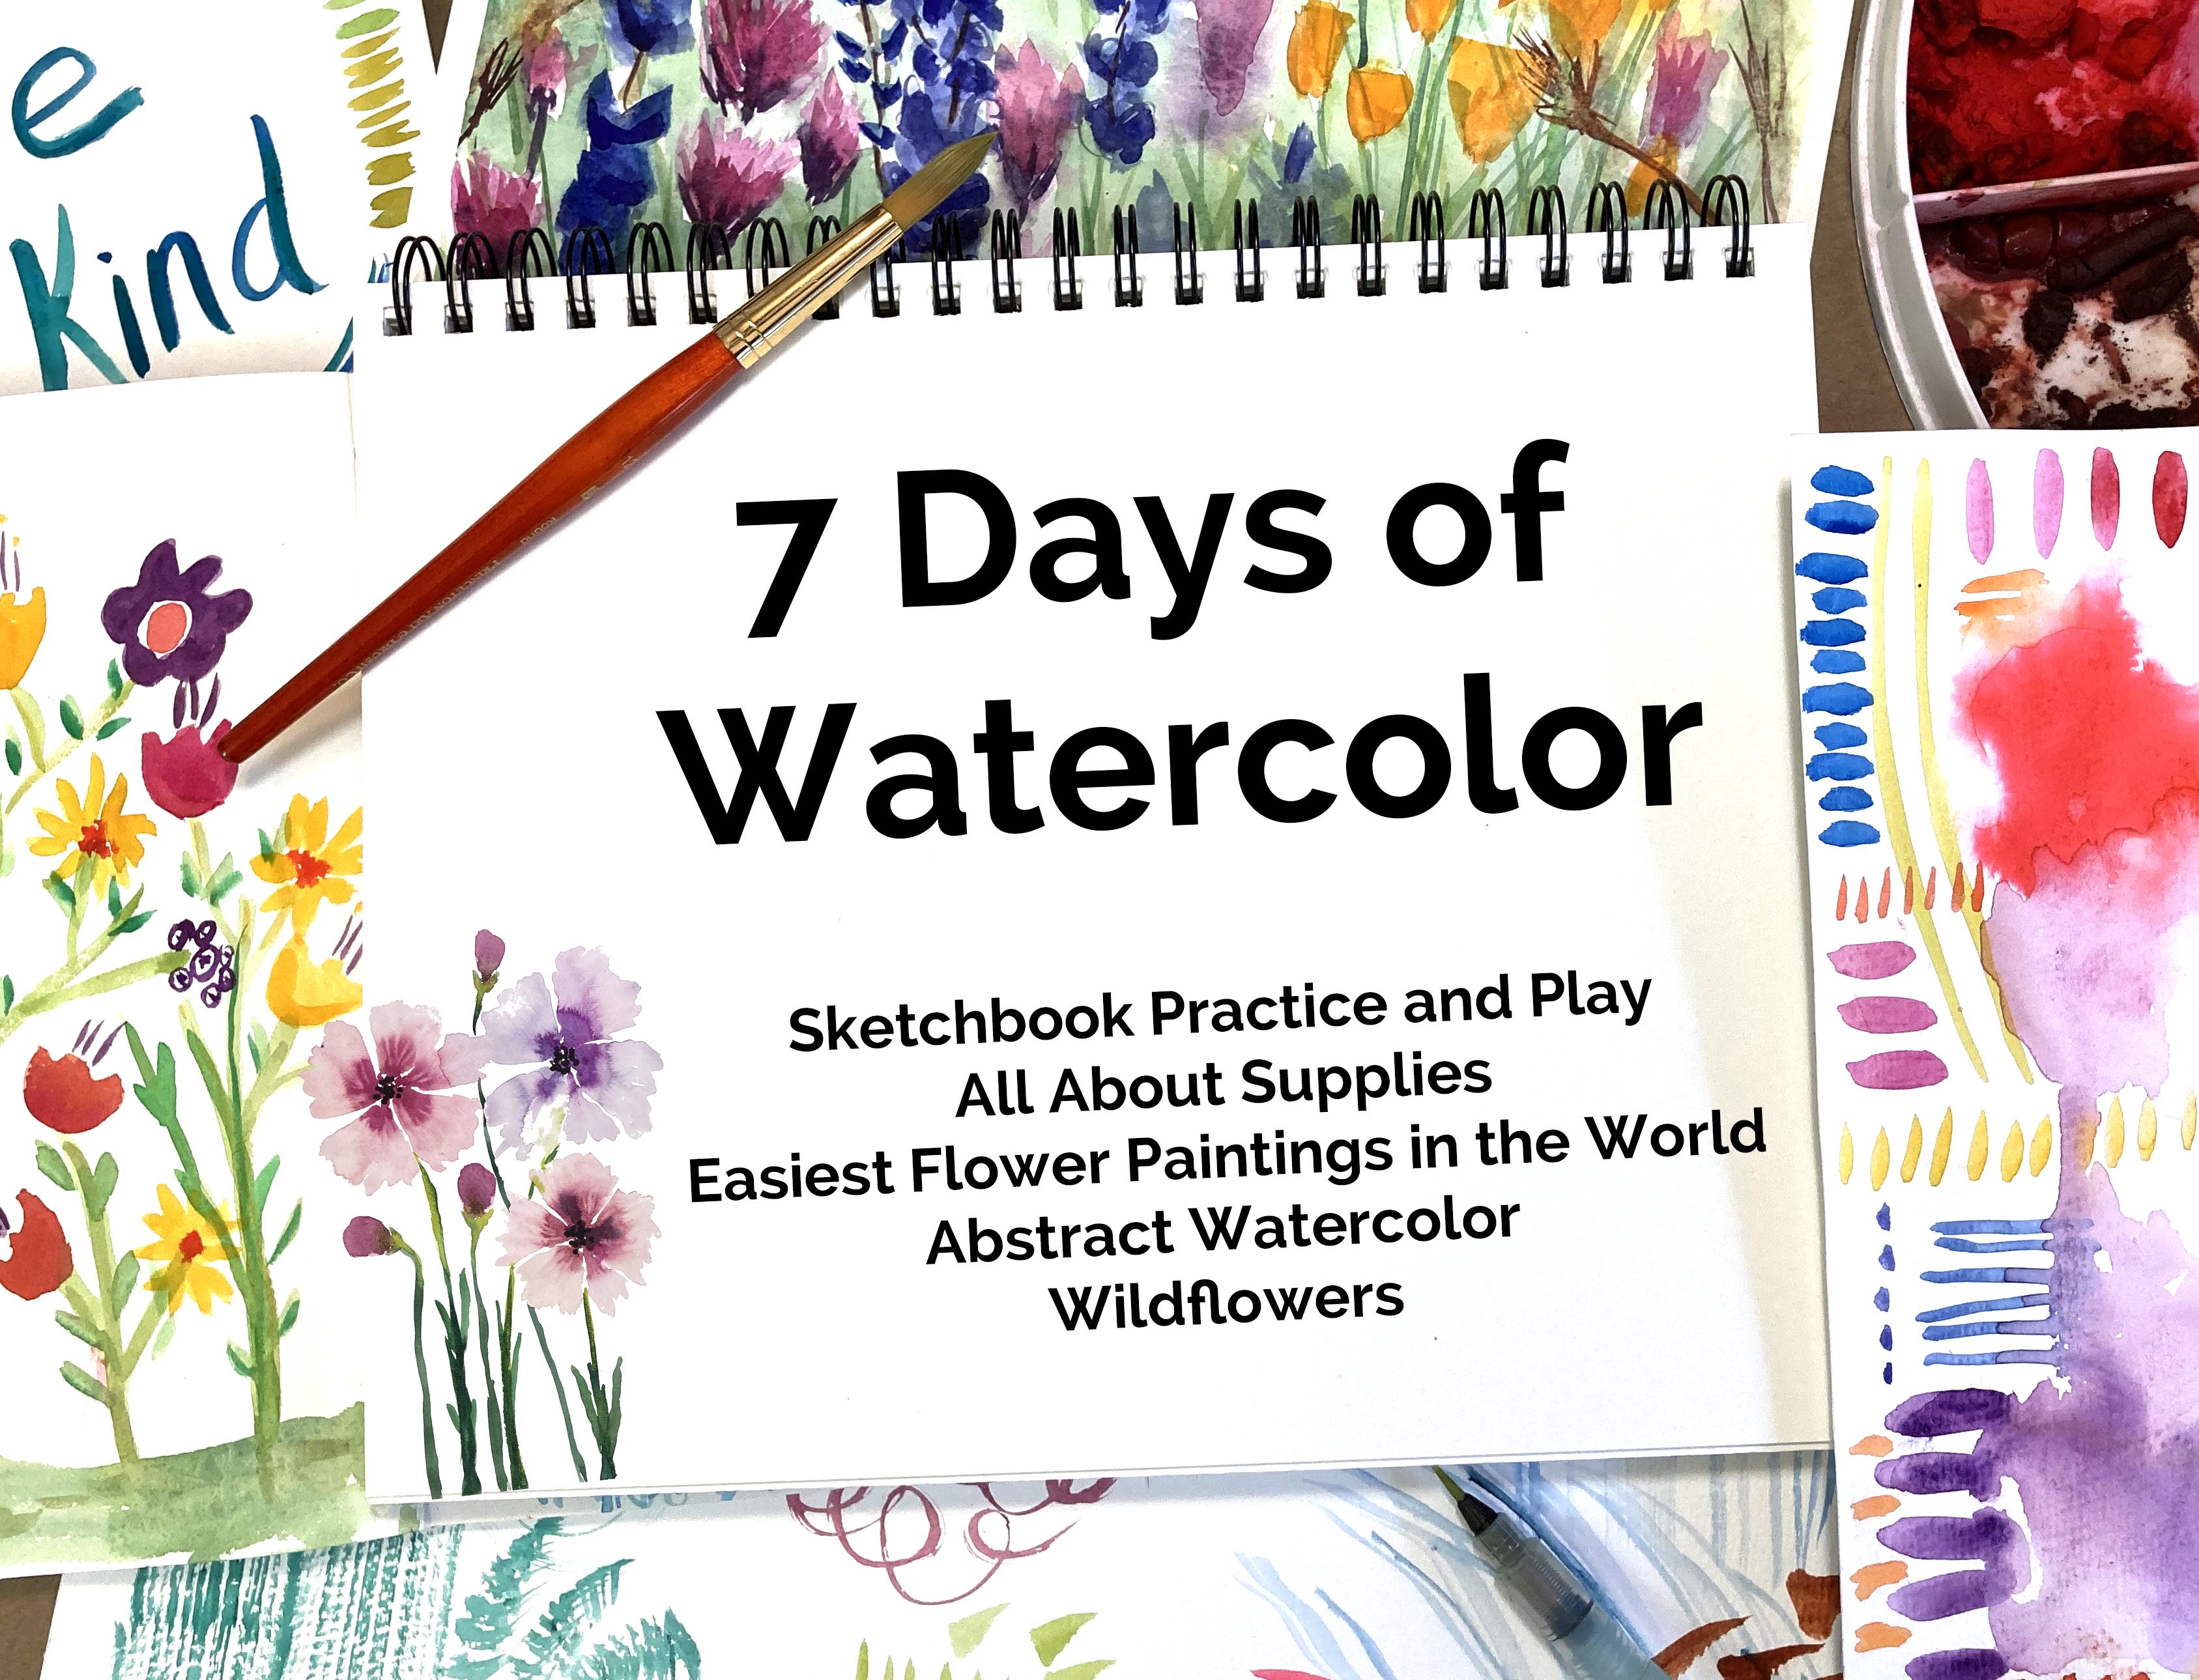 7 Days of Watercolor Mini Course